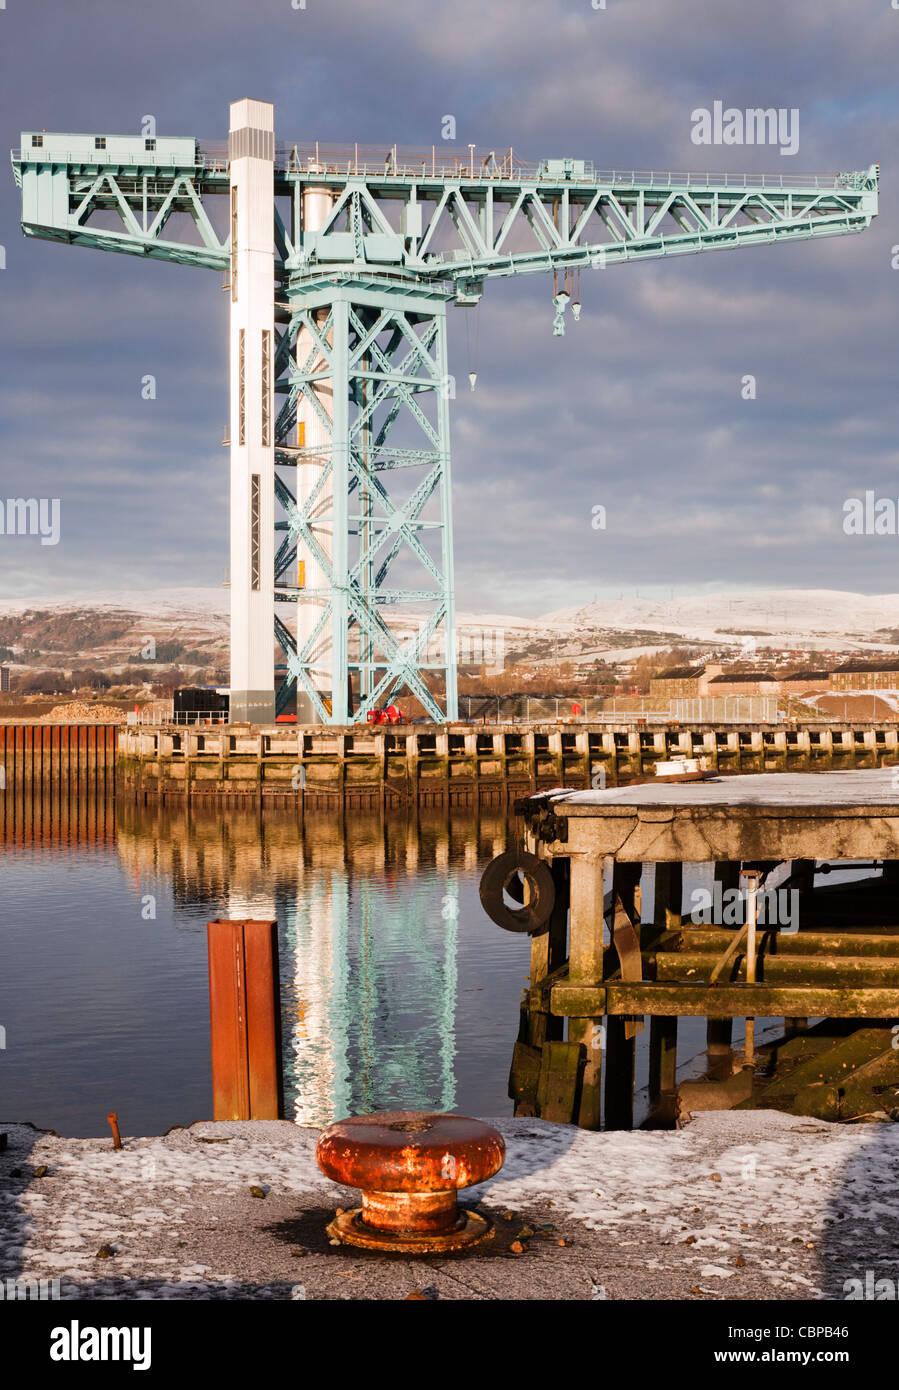 The Titan crane at the site of the former John Brown's shipyard, Clydebank, Scotland. - Stock Image